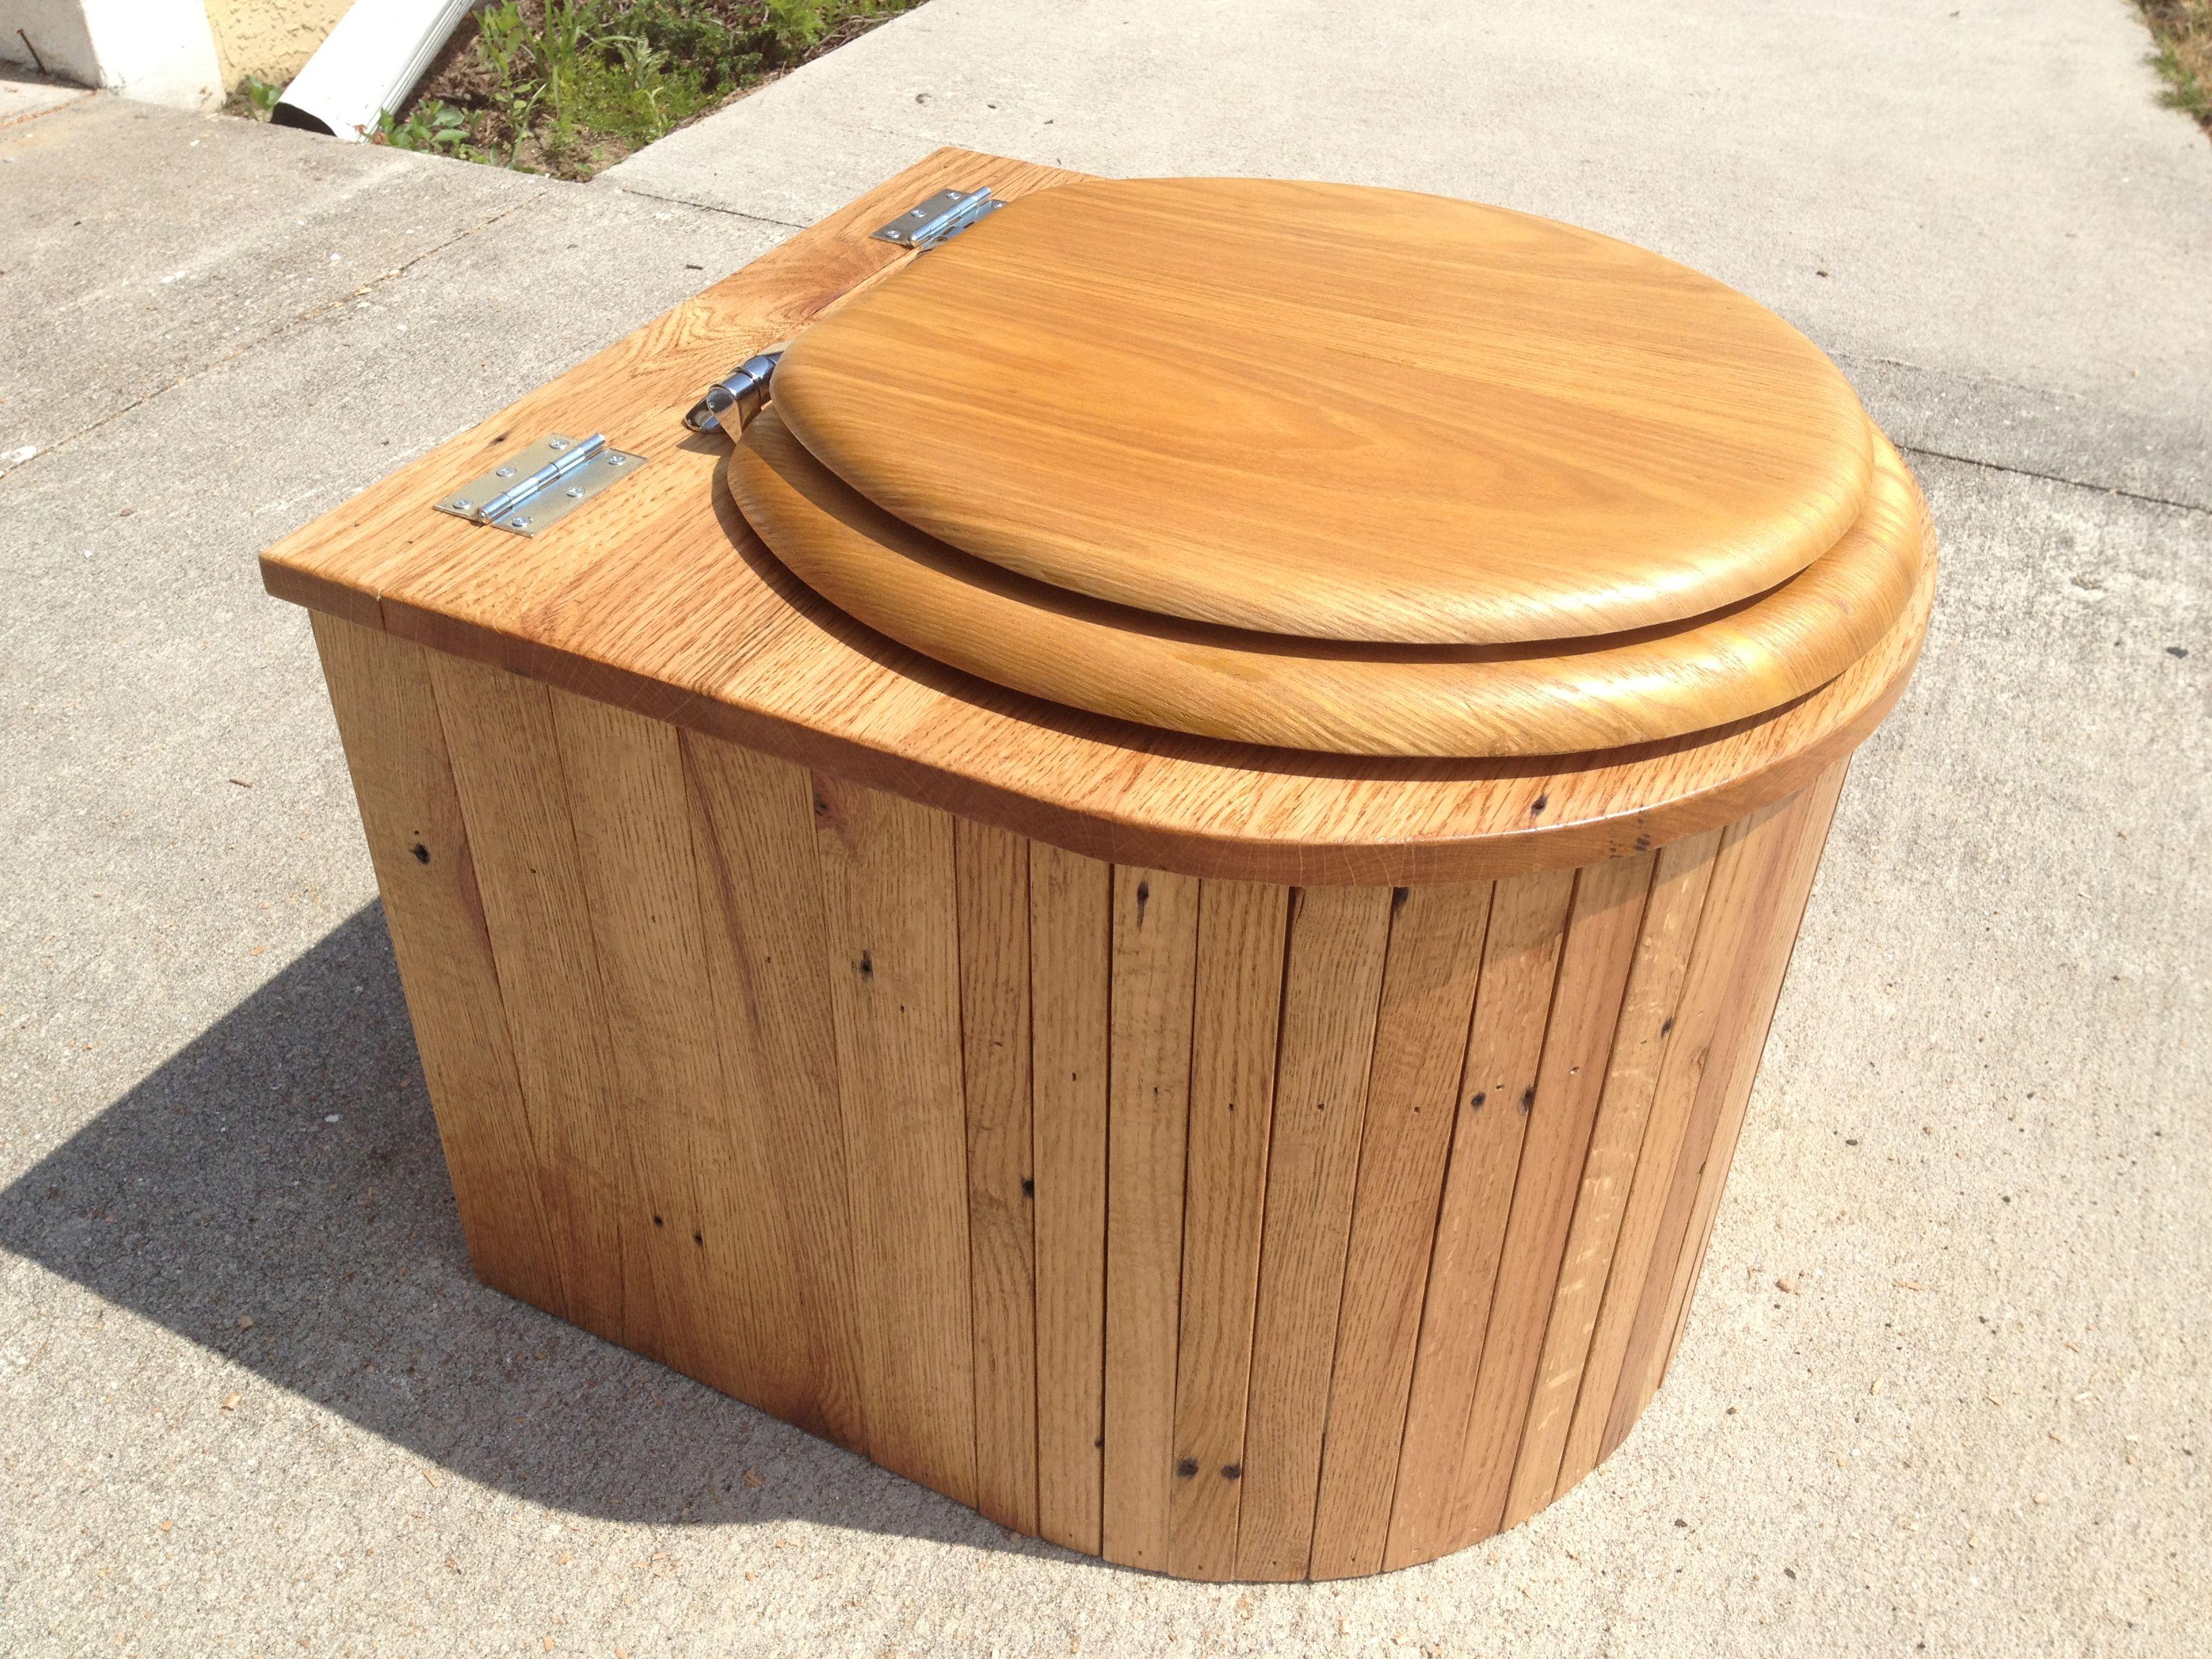 Oak Wood Composting Toilet Photo Pictures | Tiny | Pinterest ...